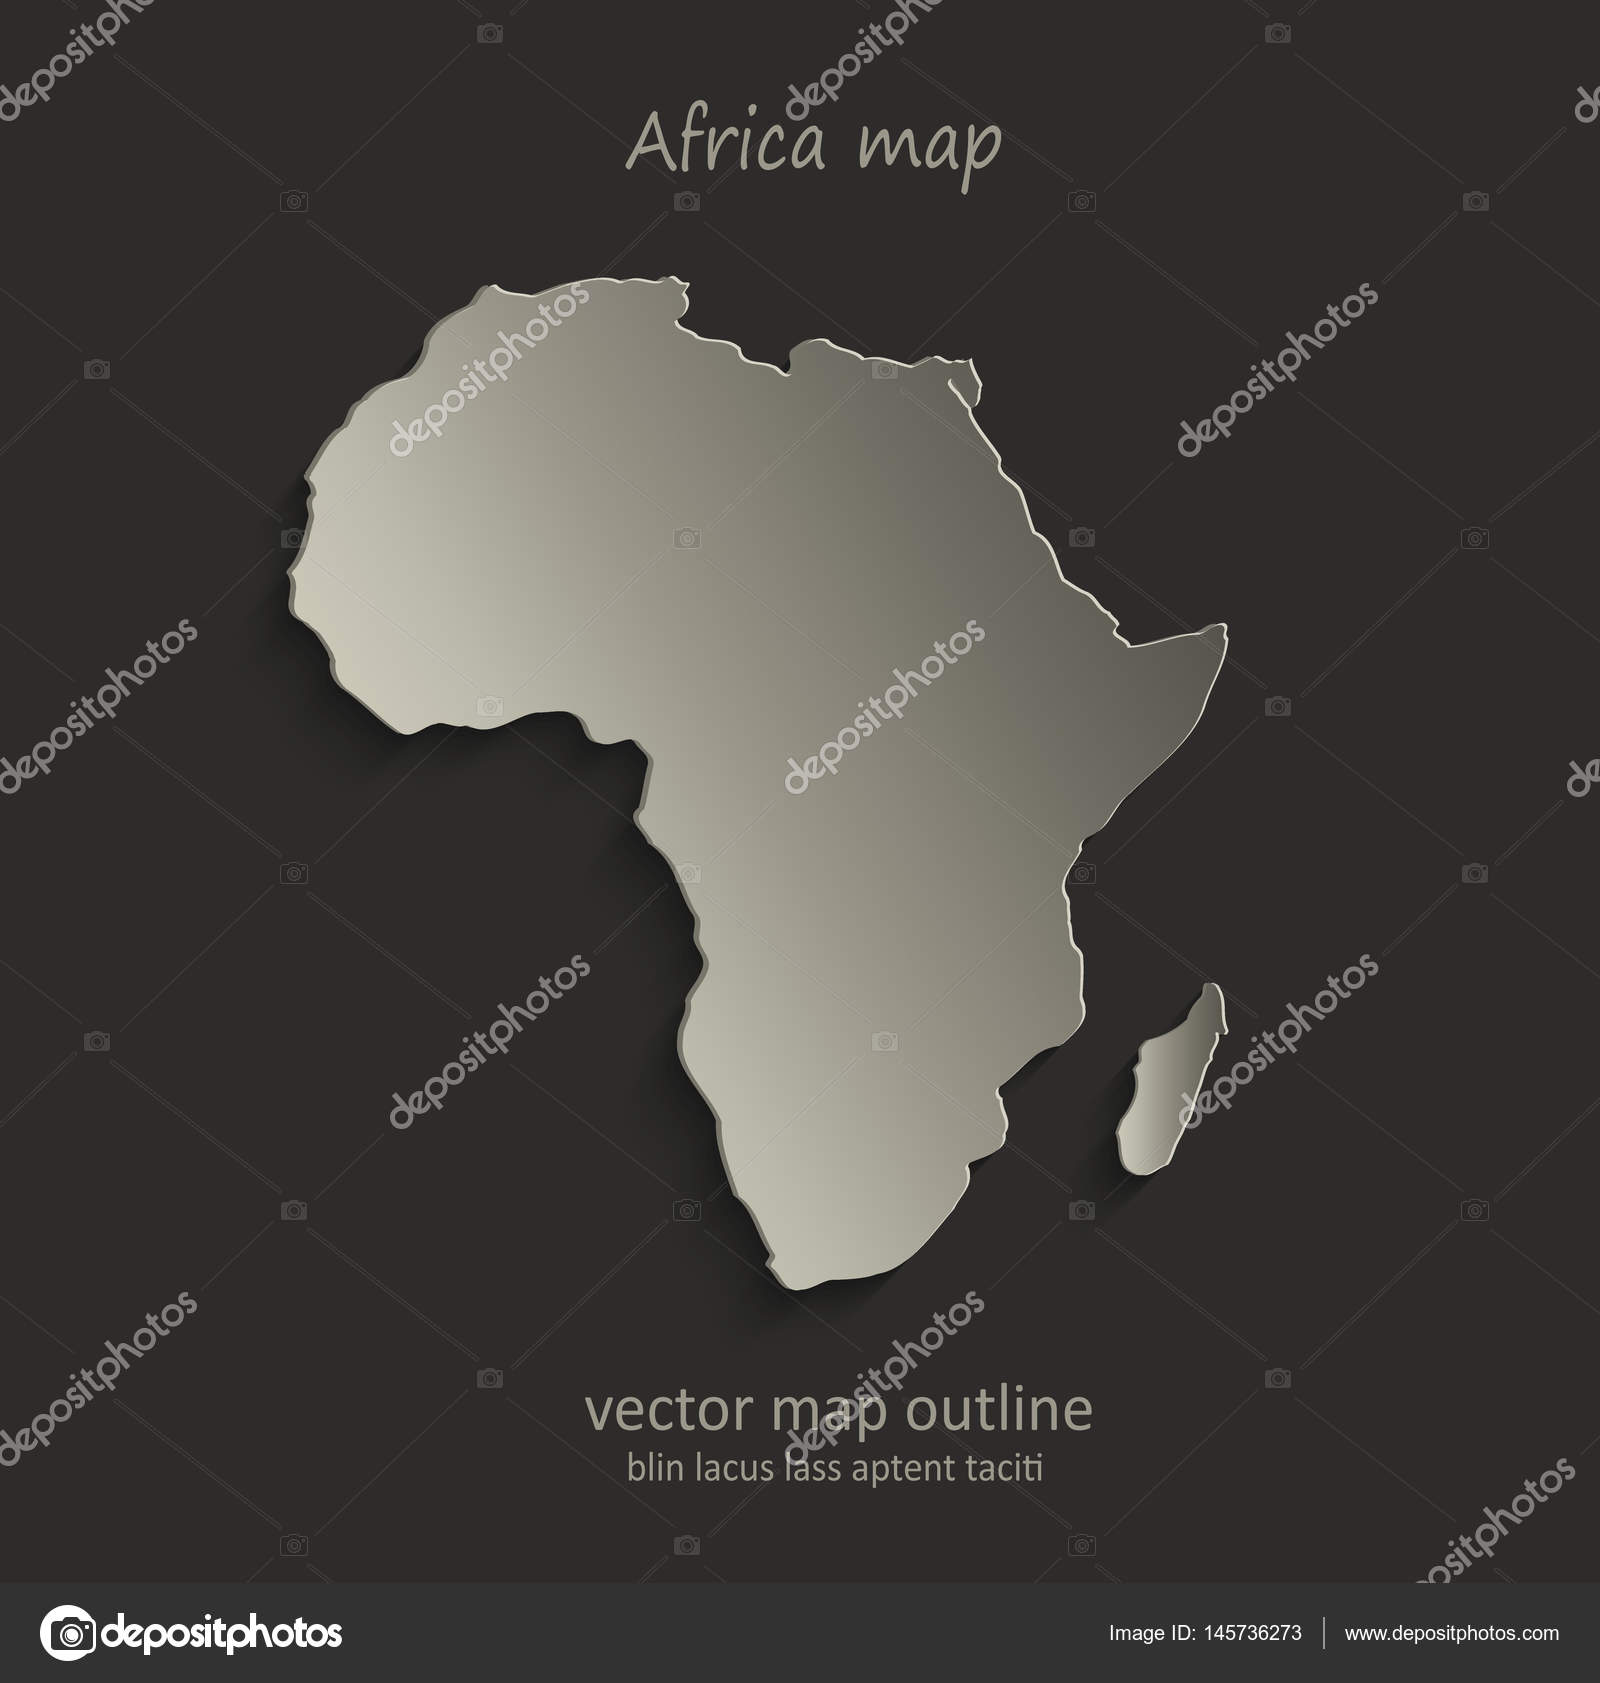 Africa Map Outline Card Blank Black Vector Stock Vector C Mondi H